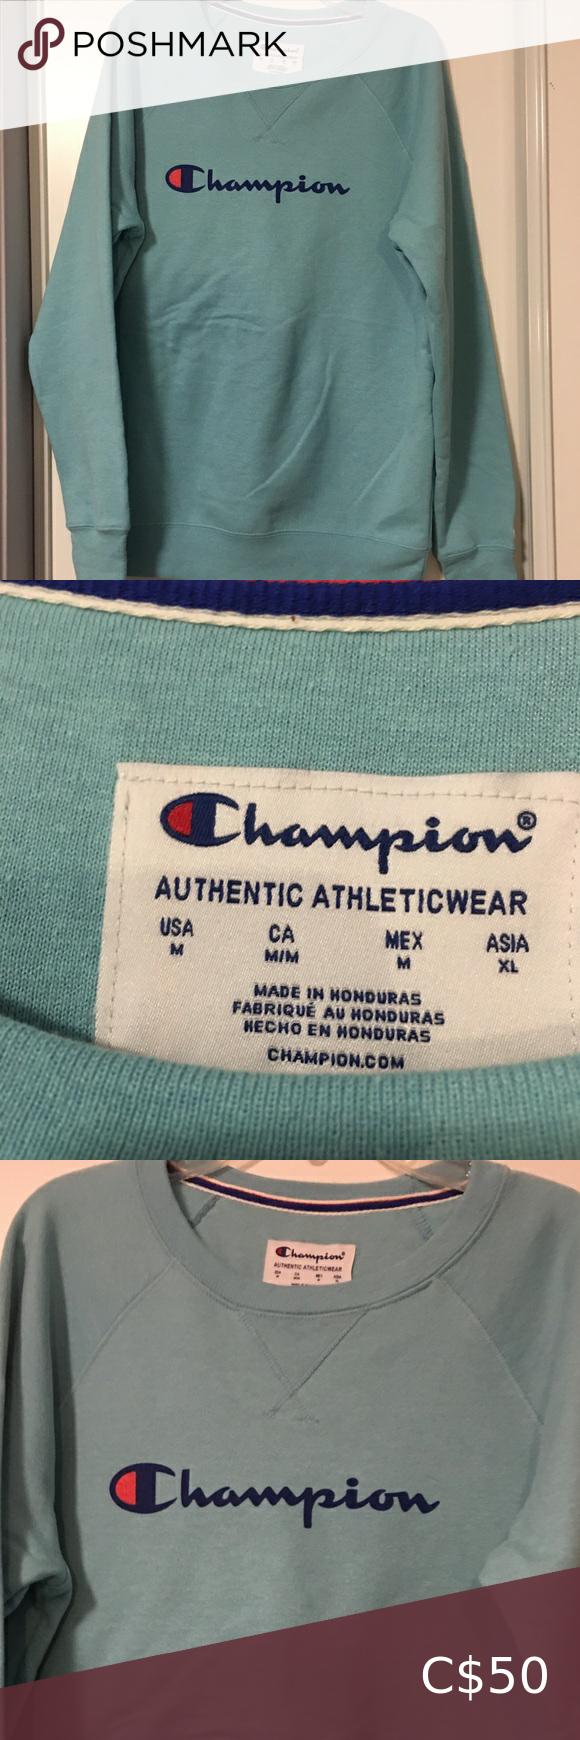 Champion Authentic Athleticwear Sweatshirt Sweatshirts Champion Sweatshirt Sweatshirt Tops [ 1740 x 580 Pixel ]